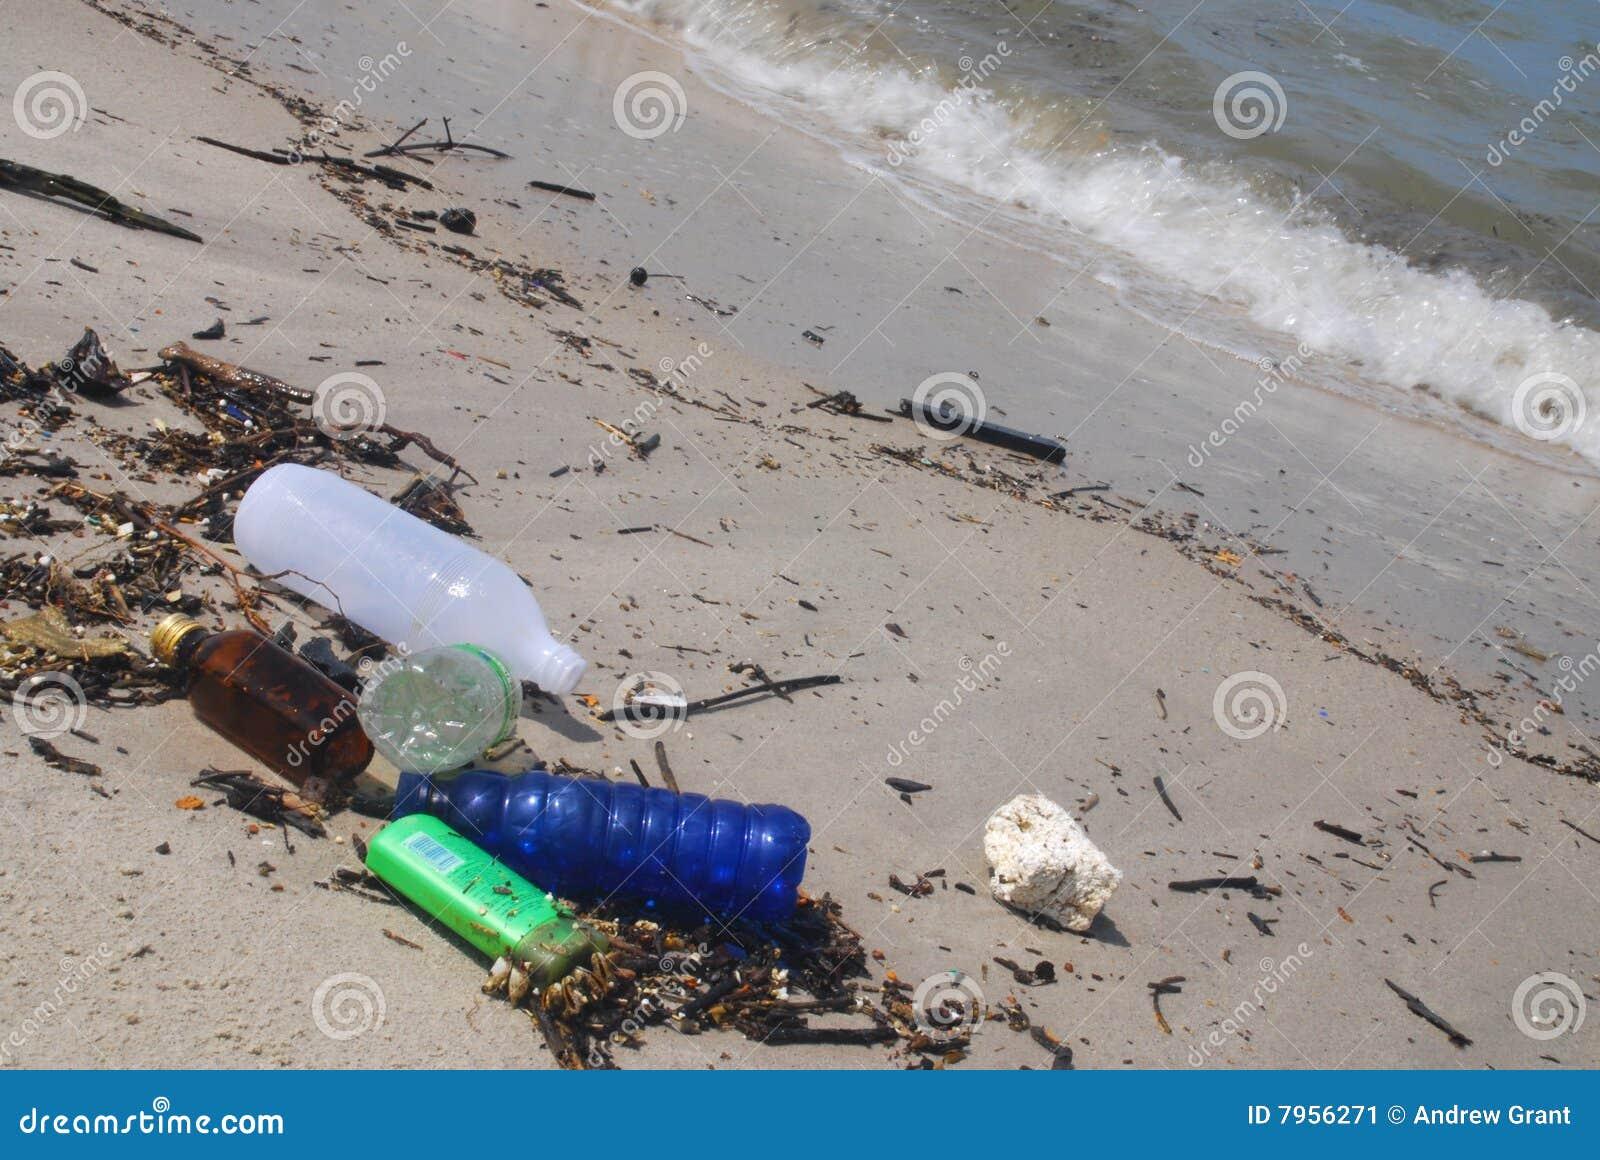 Litera de la playa